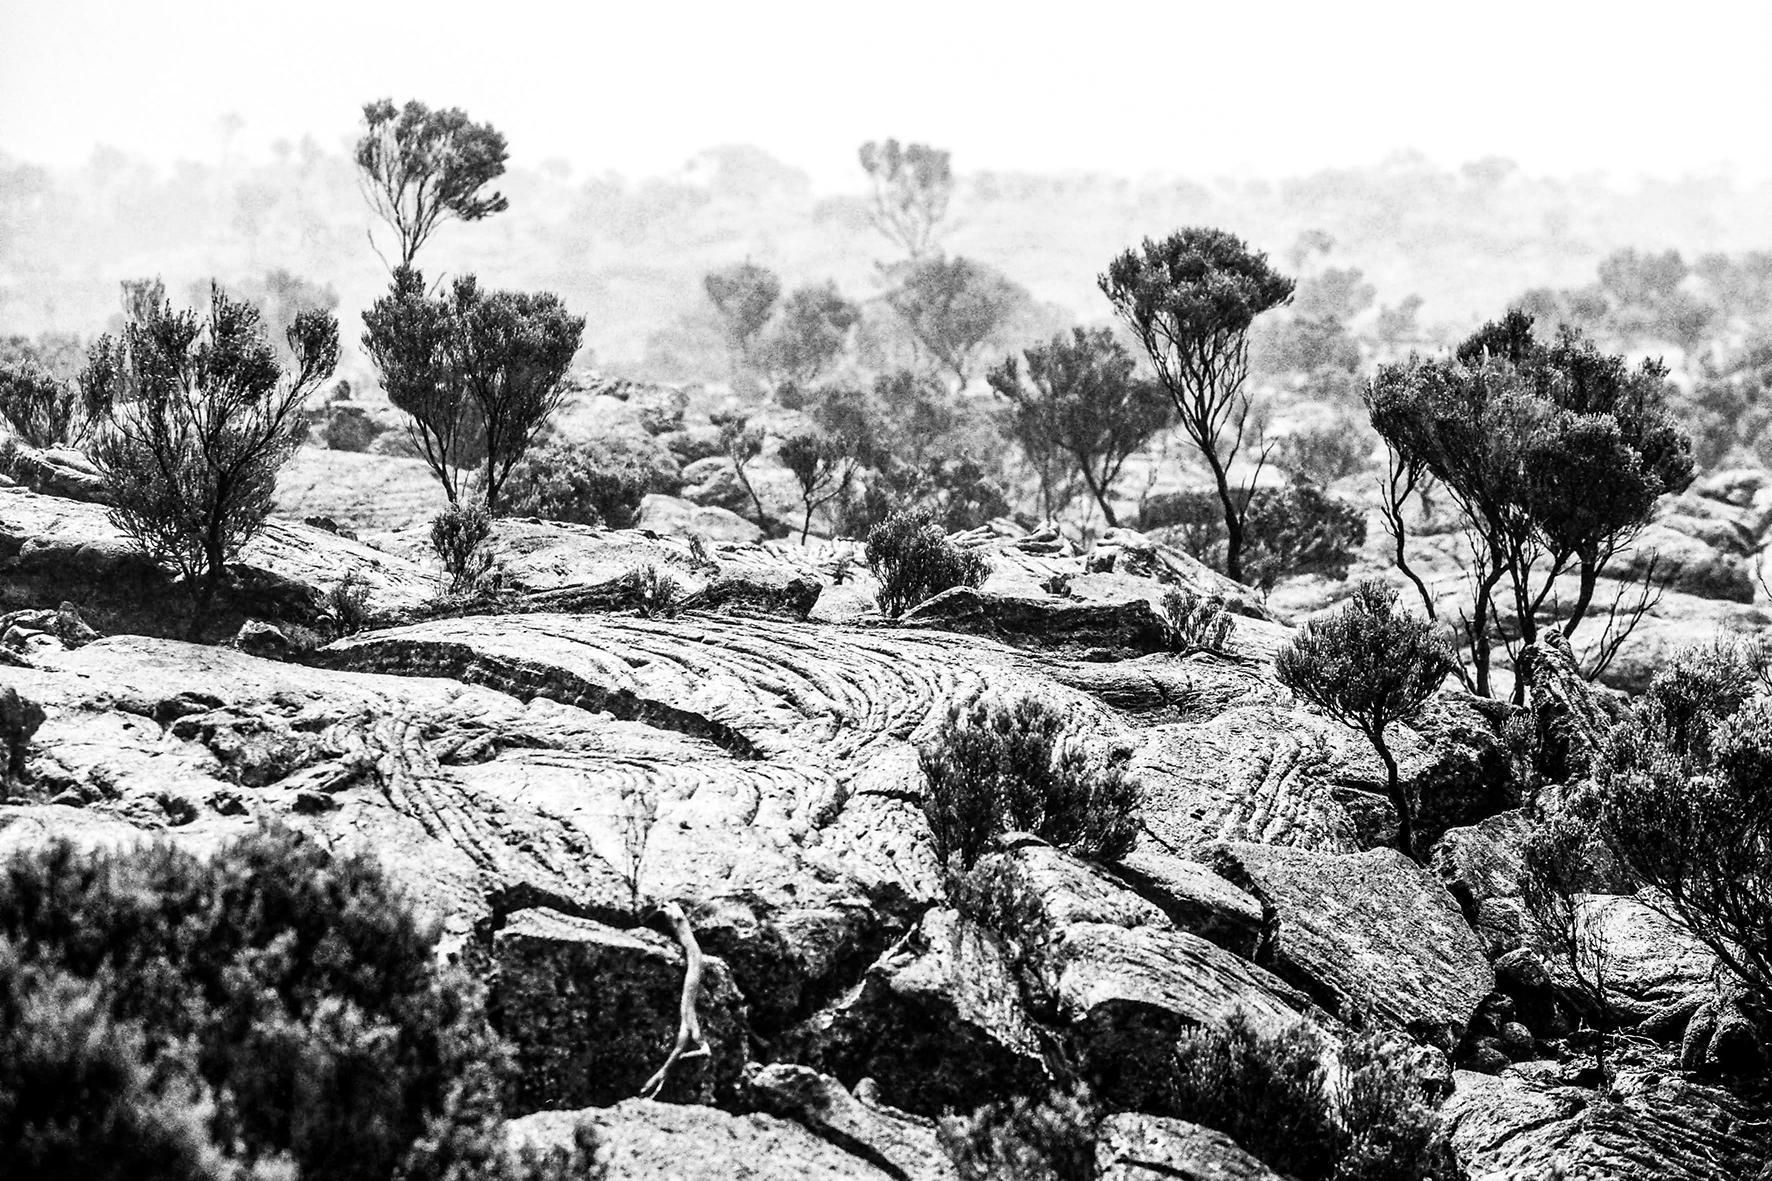 Photographe : Le graphisme naturel n°1